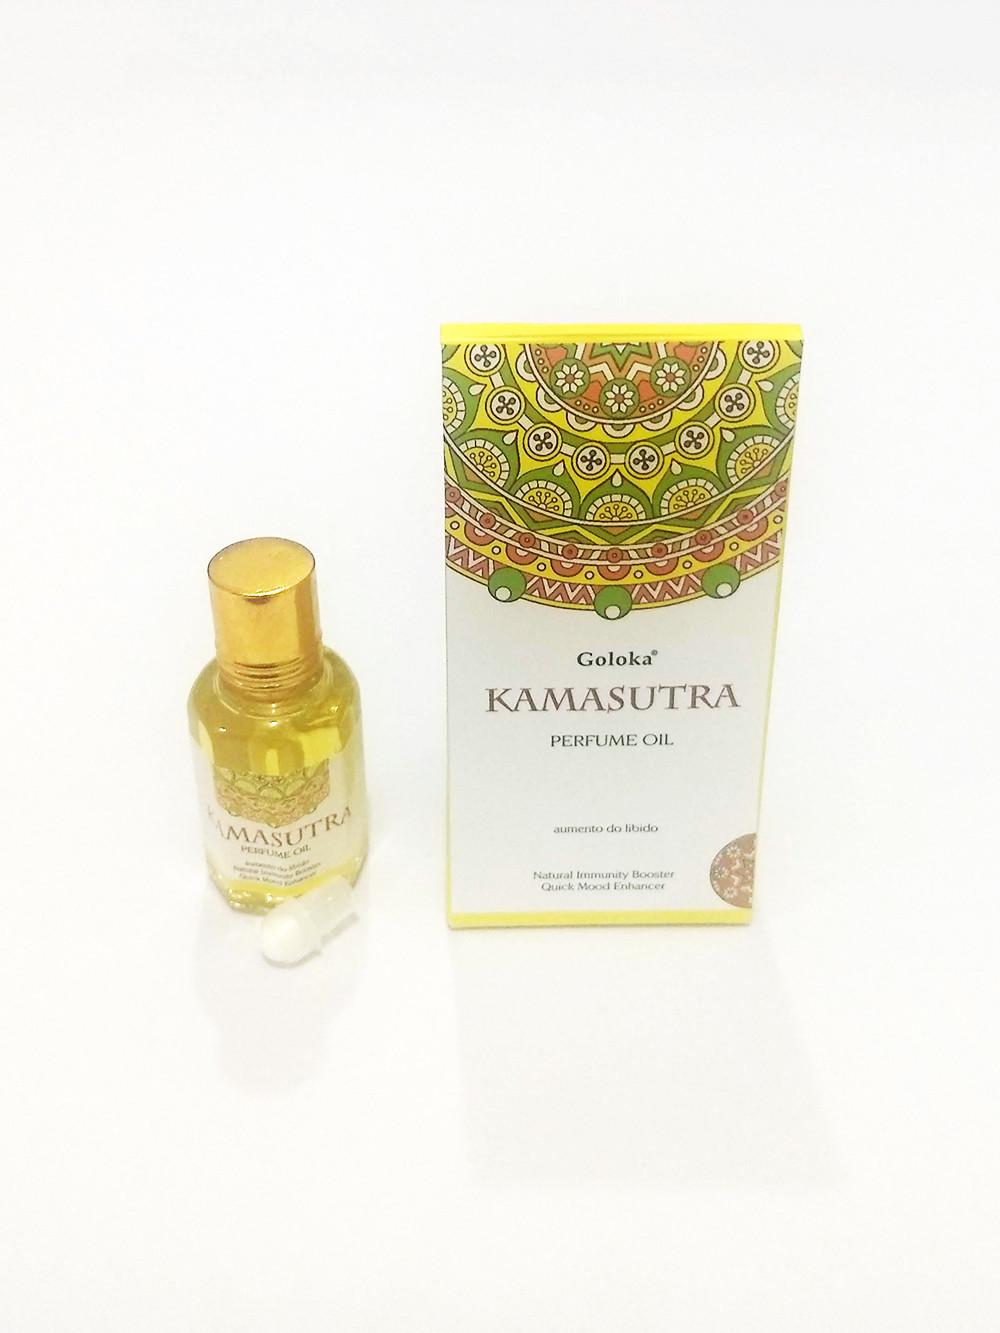 3212-01 - Óleo Perfumado Goloka Kamasutra 10ml